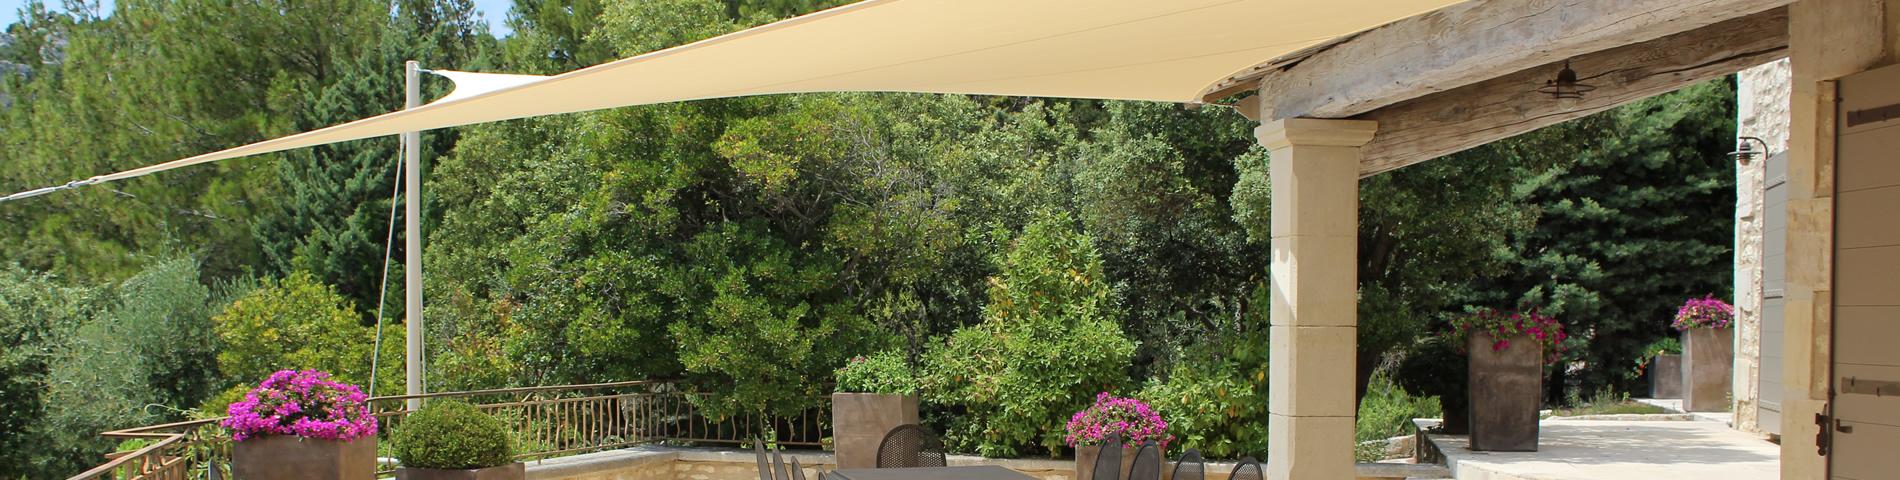 shade sail structures garden shade sails sail shade. Black Bedroom Furniture Sets. Home Design Ideas